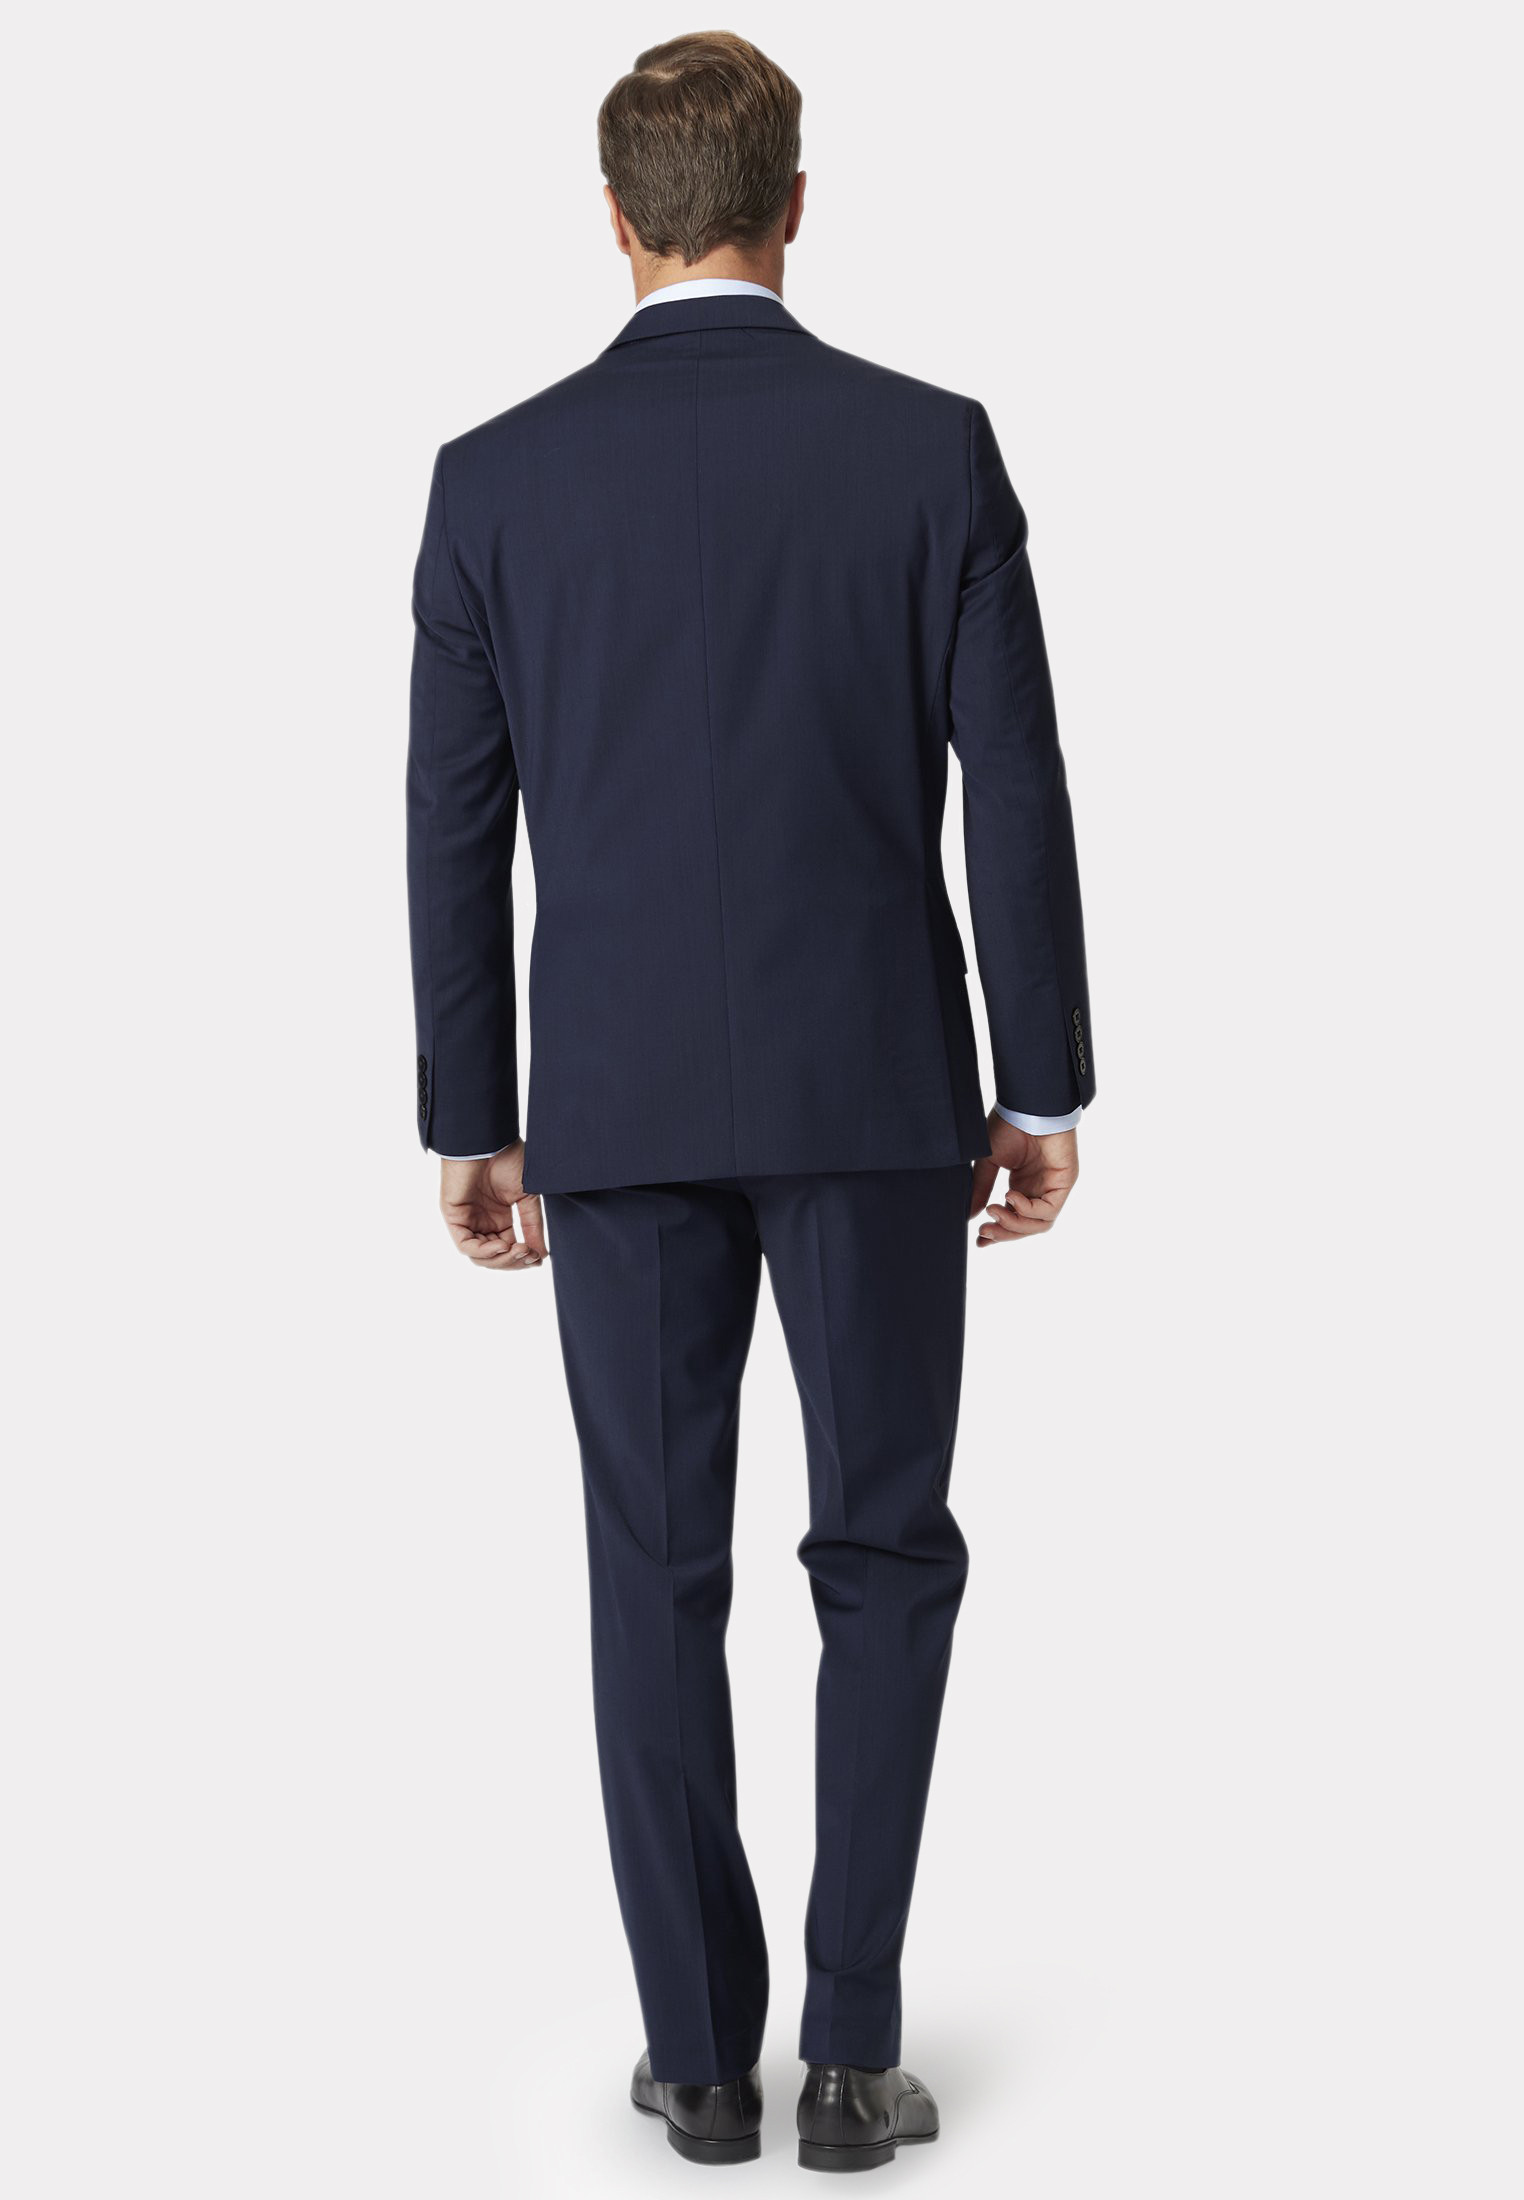 Avalino Mid Blue Three Piece Travel Suit - Waistcoat Optional